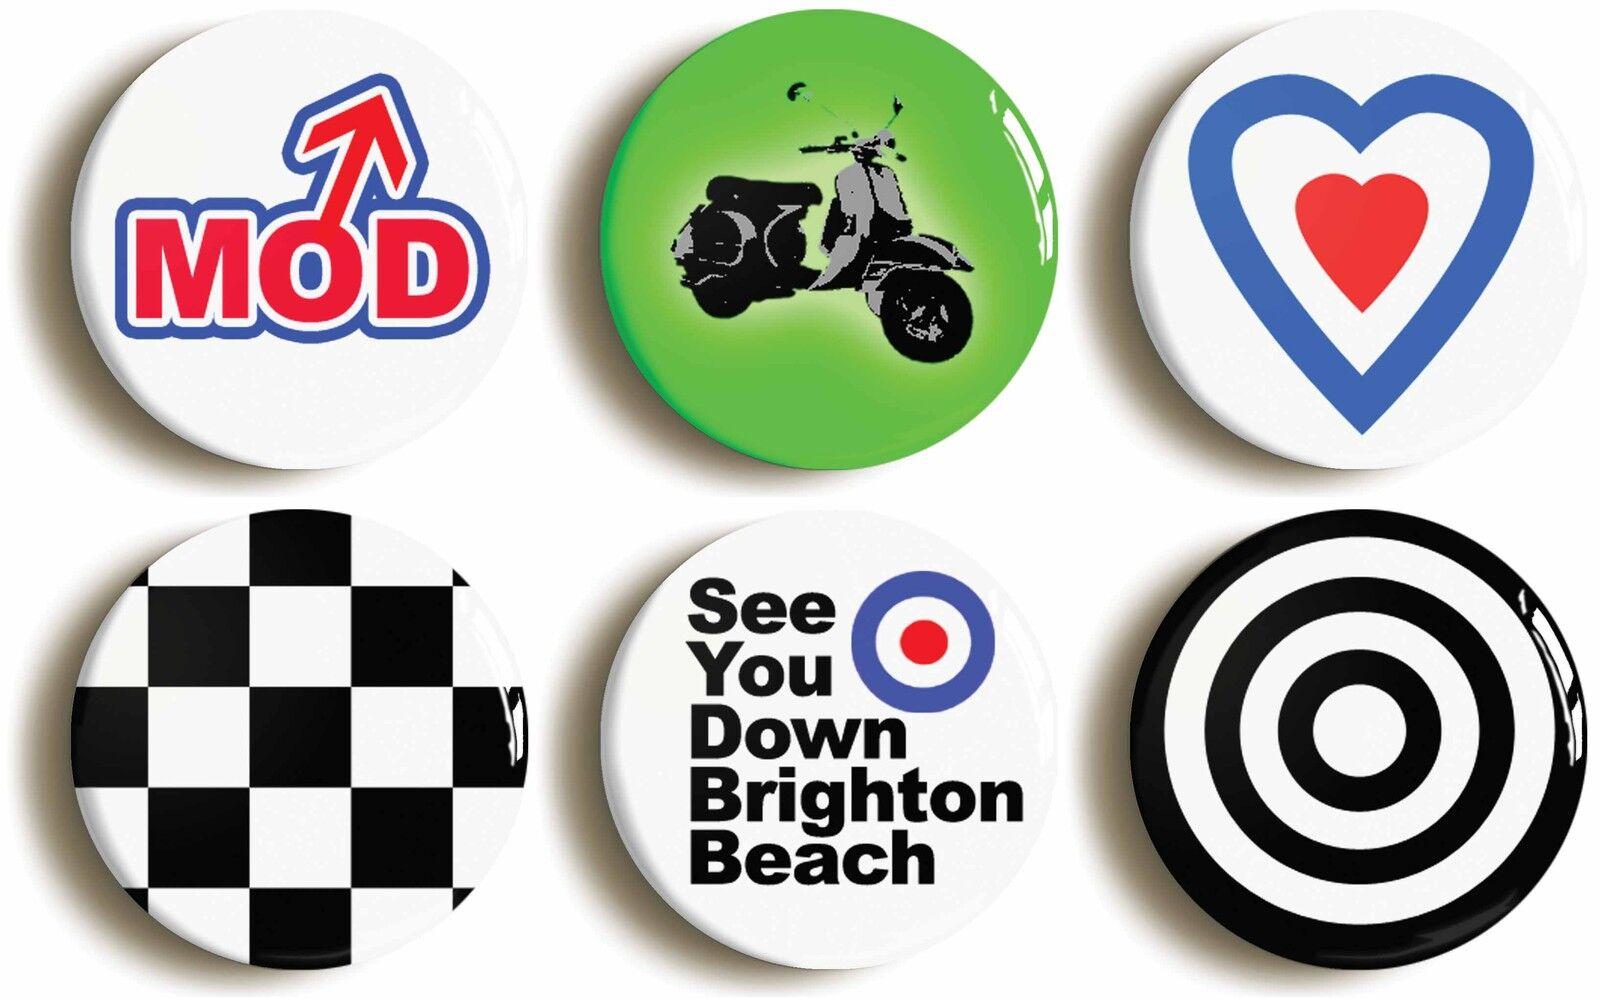 6 x mod badge button pin fancy dress set (size is 1inch/25mm diameter)